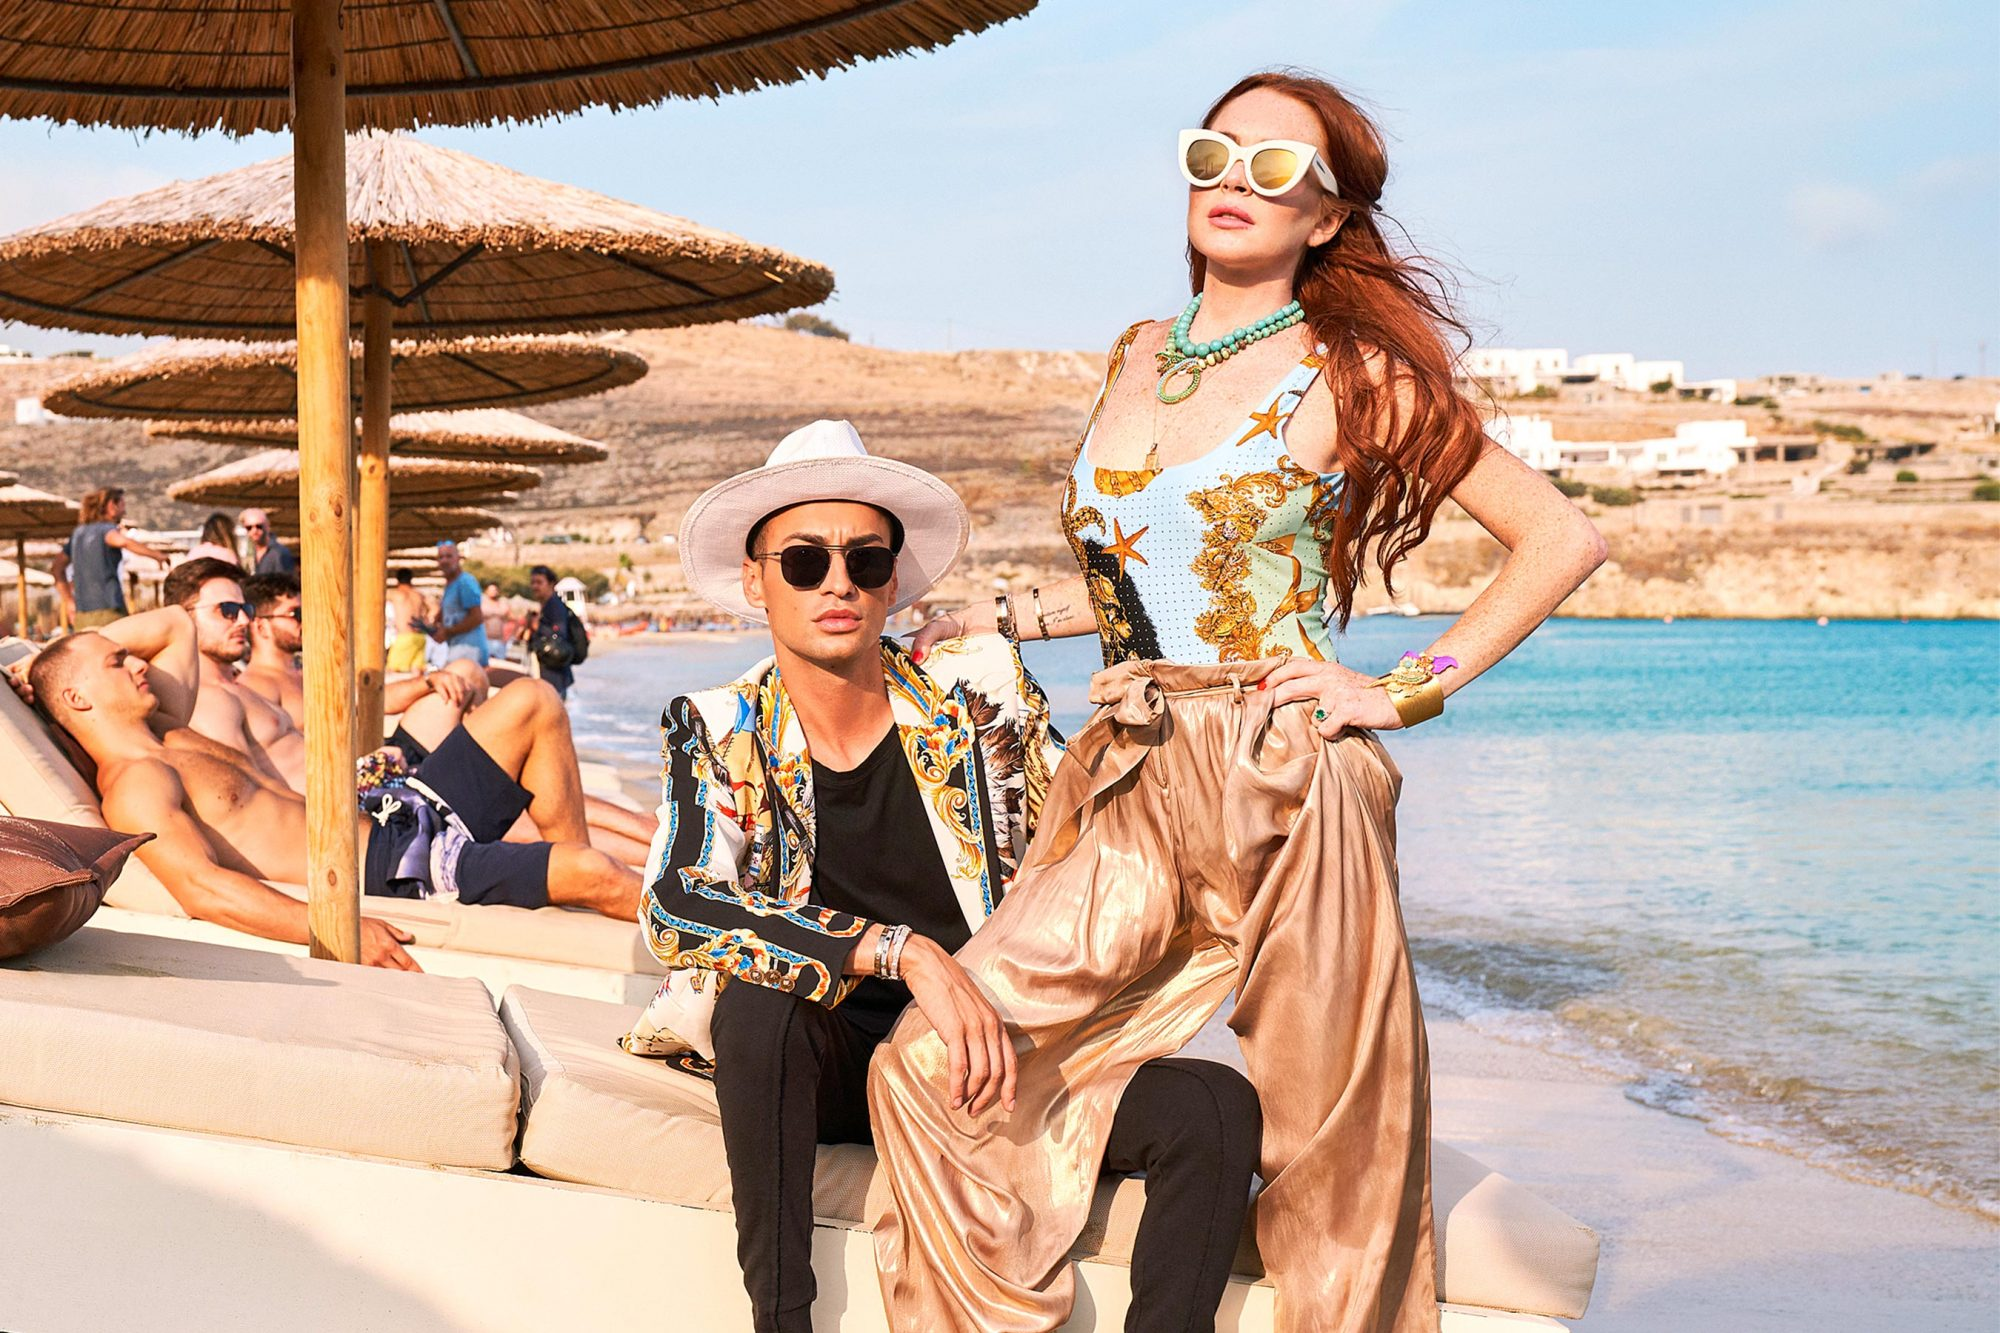 Lindsay Lohan's Beach ClubGalleryPictured: Panos, Lindsay Lohan